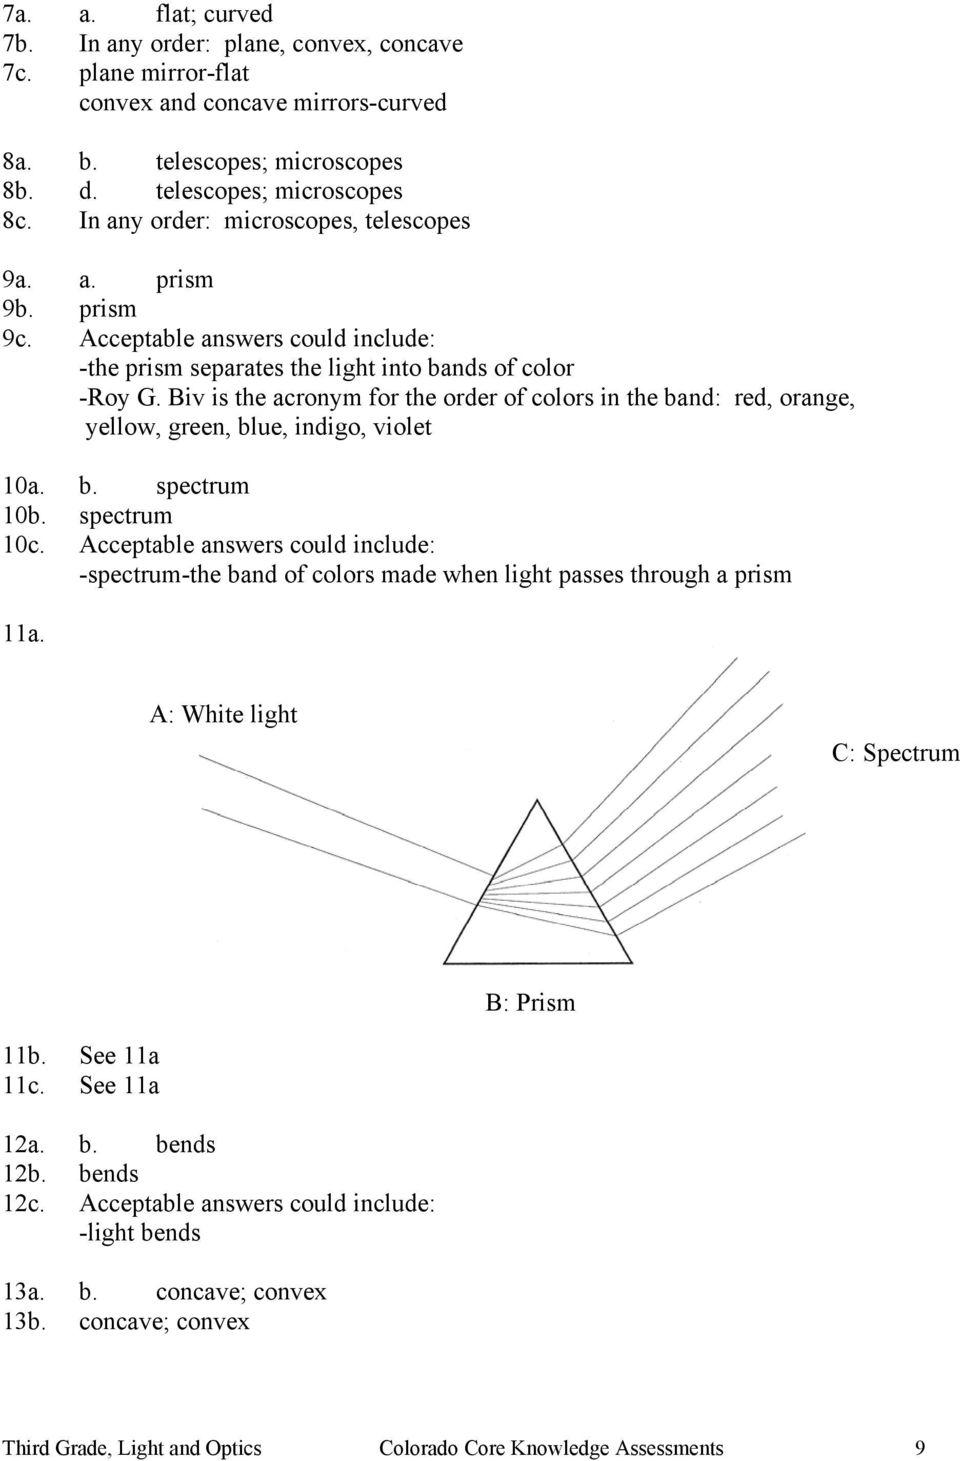 hight resolution of Third Grade Light and Optics Assessment - PDF Free Download